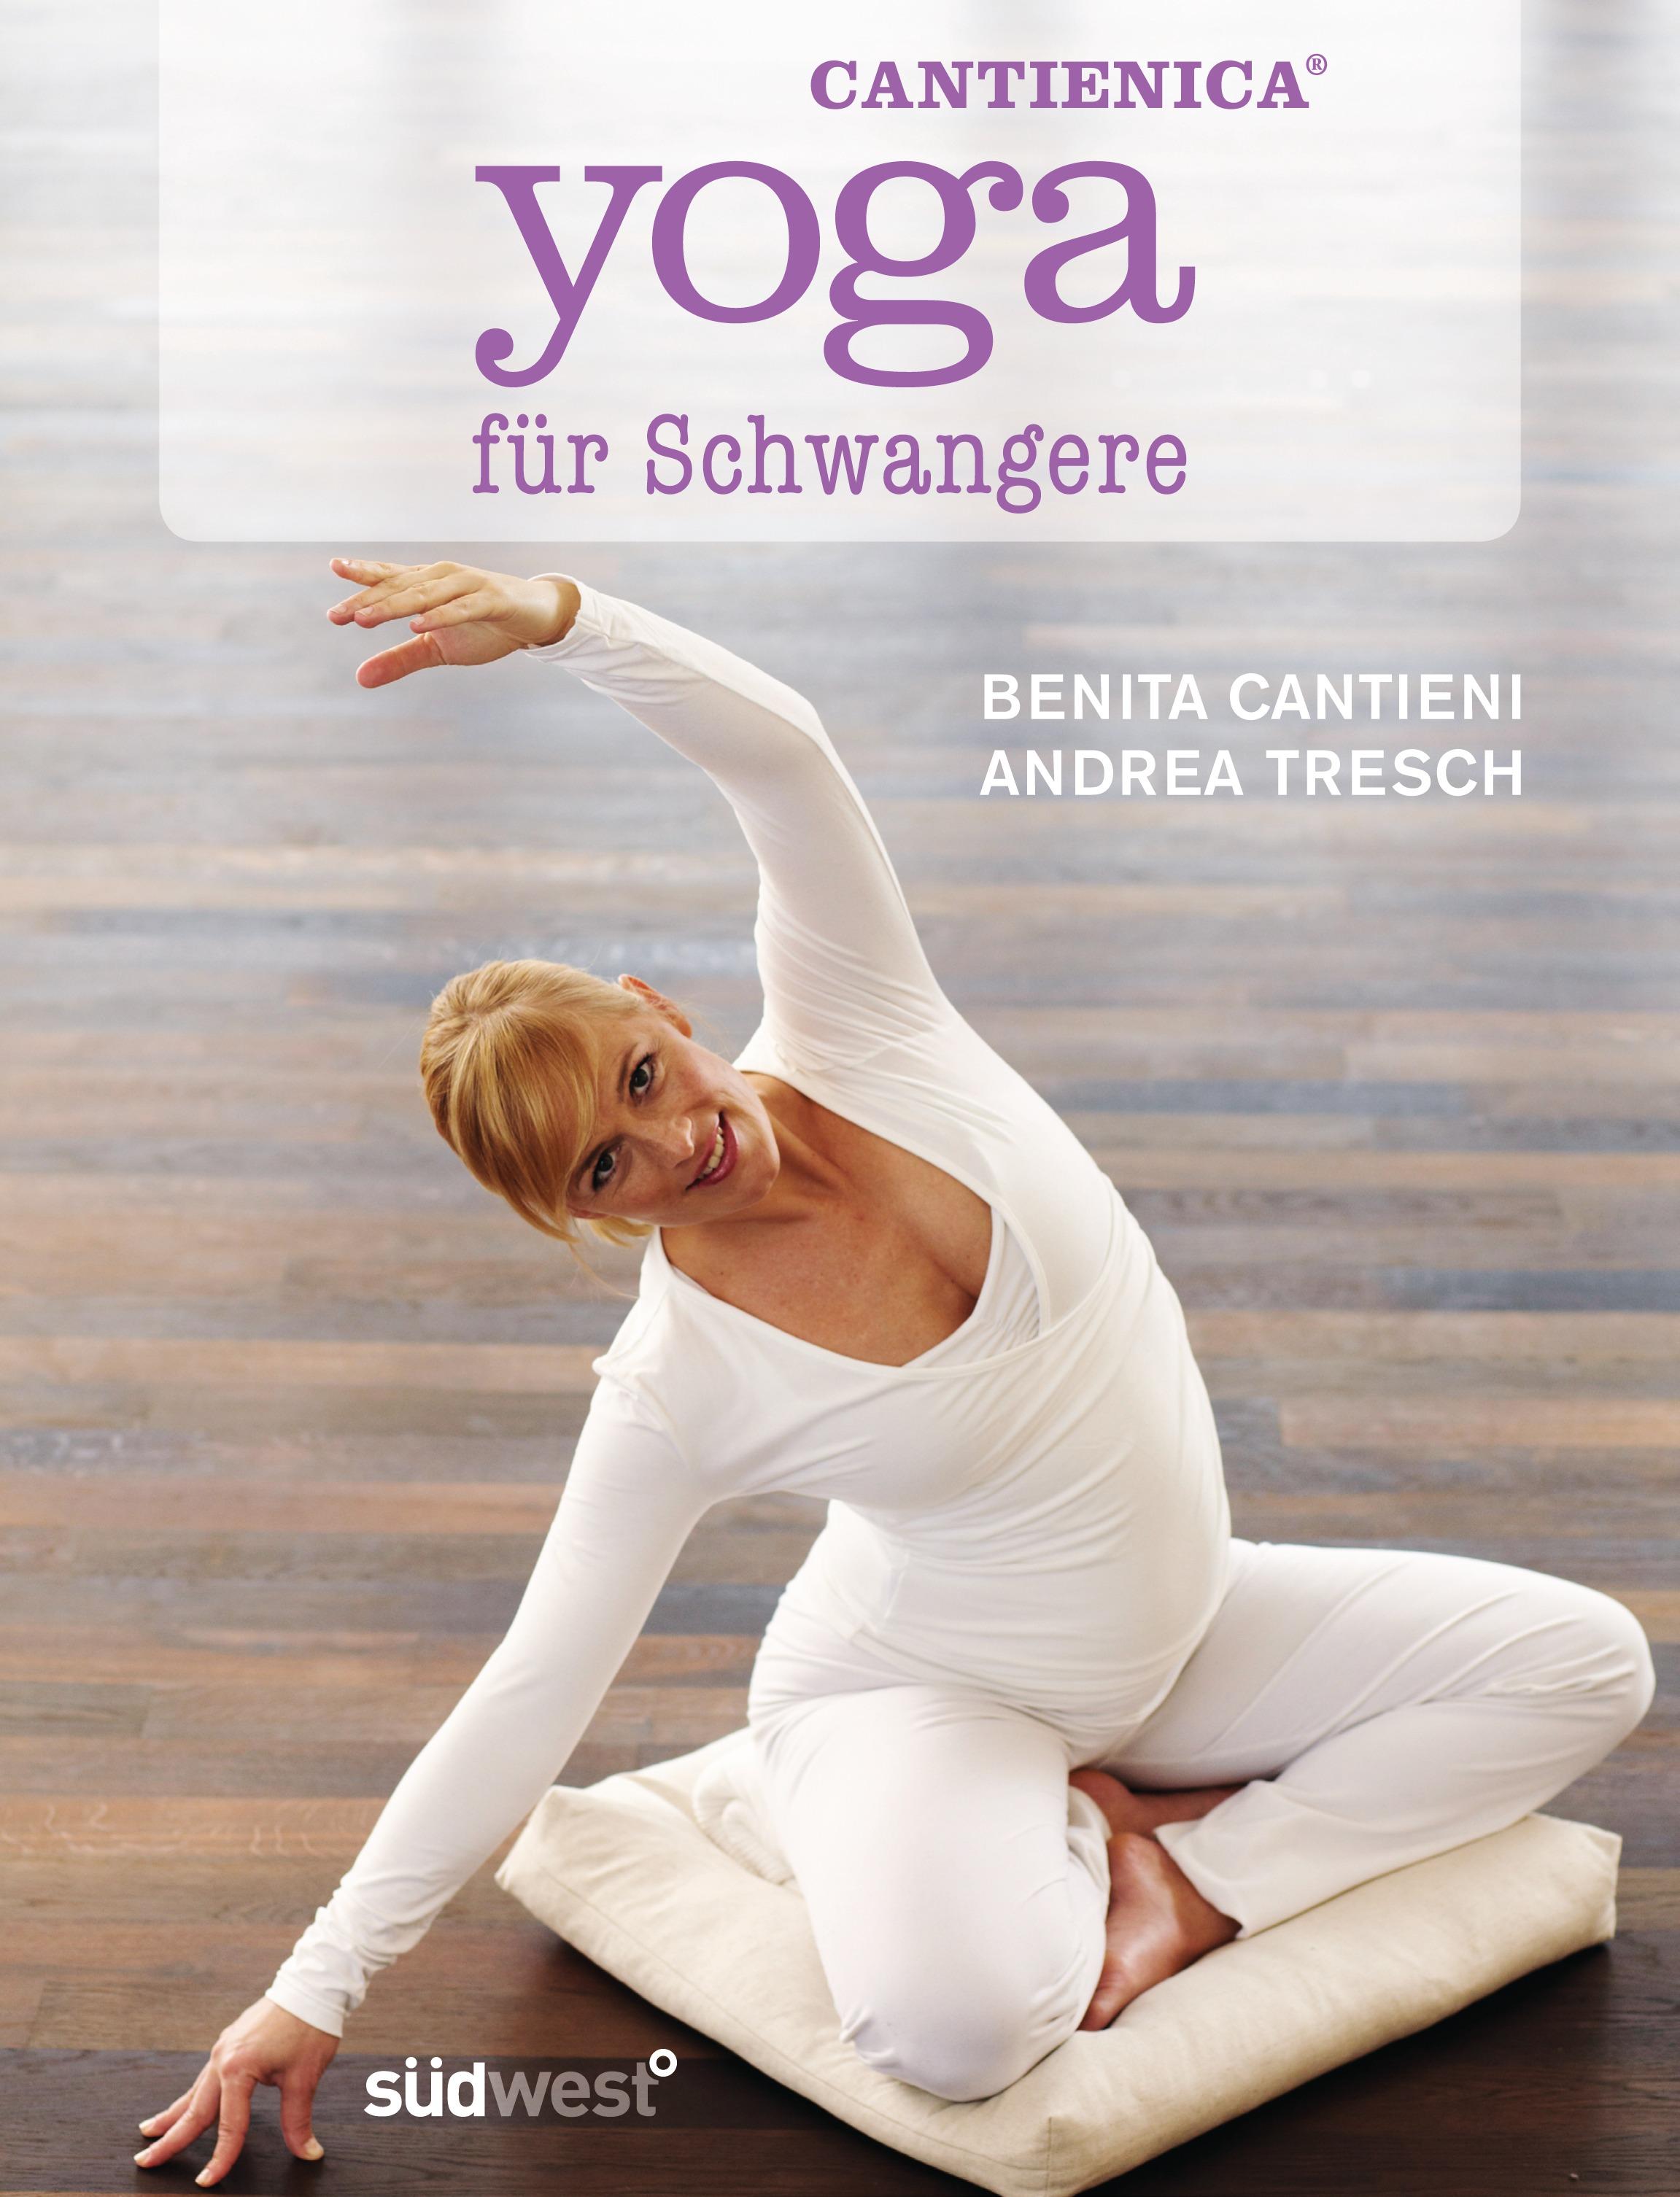 Benita Cantieni, Andrea Tresch